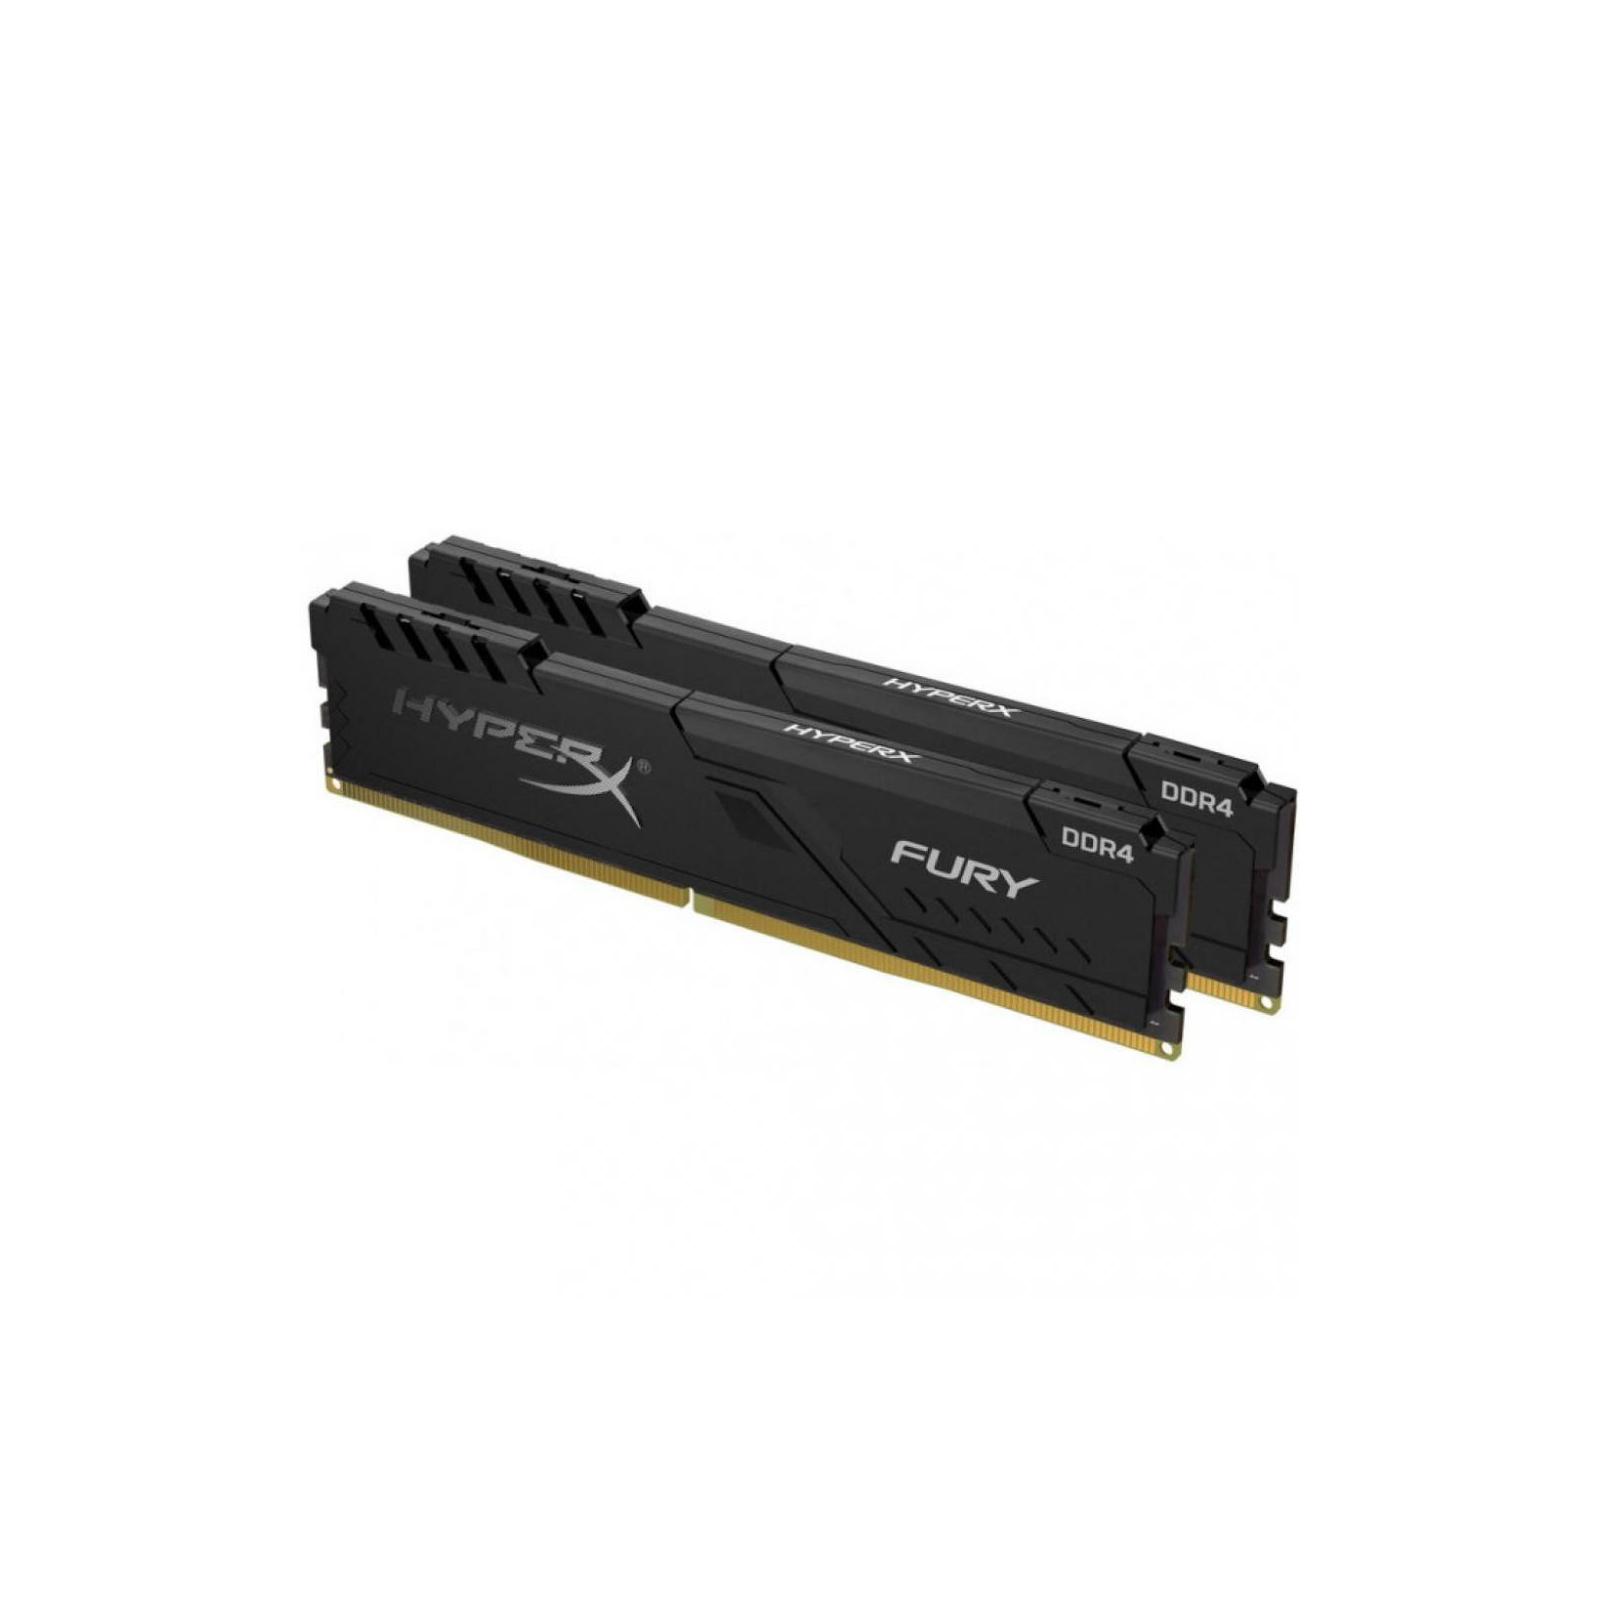 Модуль памяти для компьютера DDR4 64GB (2x32GB) 3000 MHz HyperX Fury Black Kingston (HX430C16FB3K2/64) изображение 2